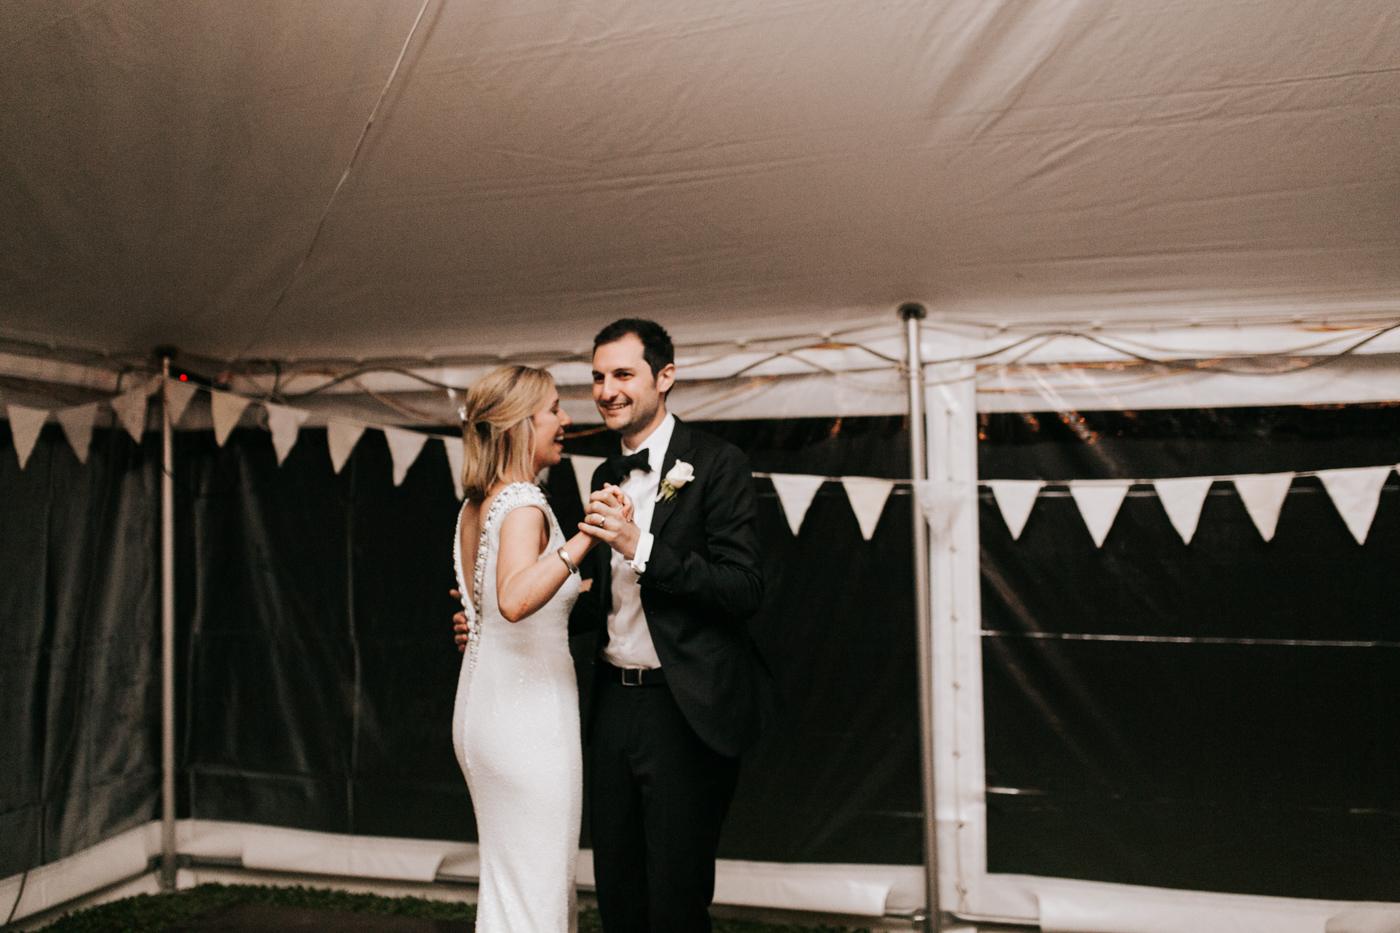 Bridget & James - Orange Country Wedding - Samantha Heather Photography-270.jpg